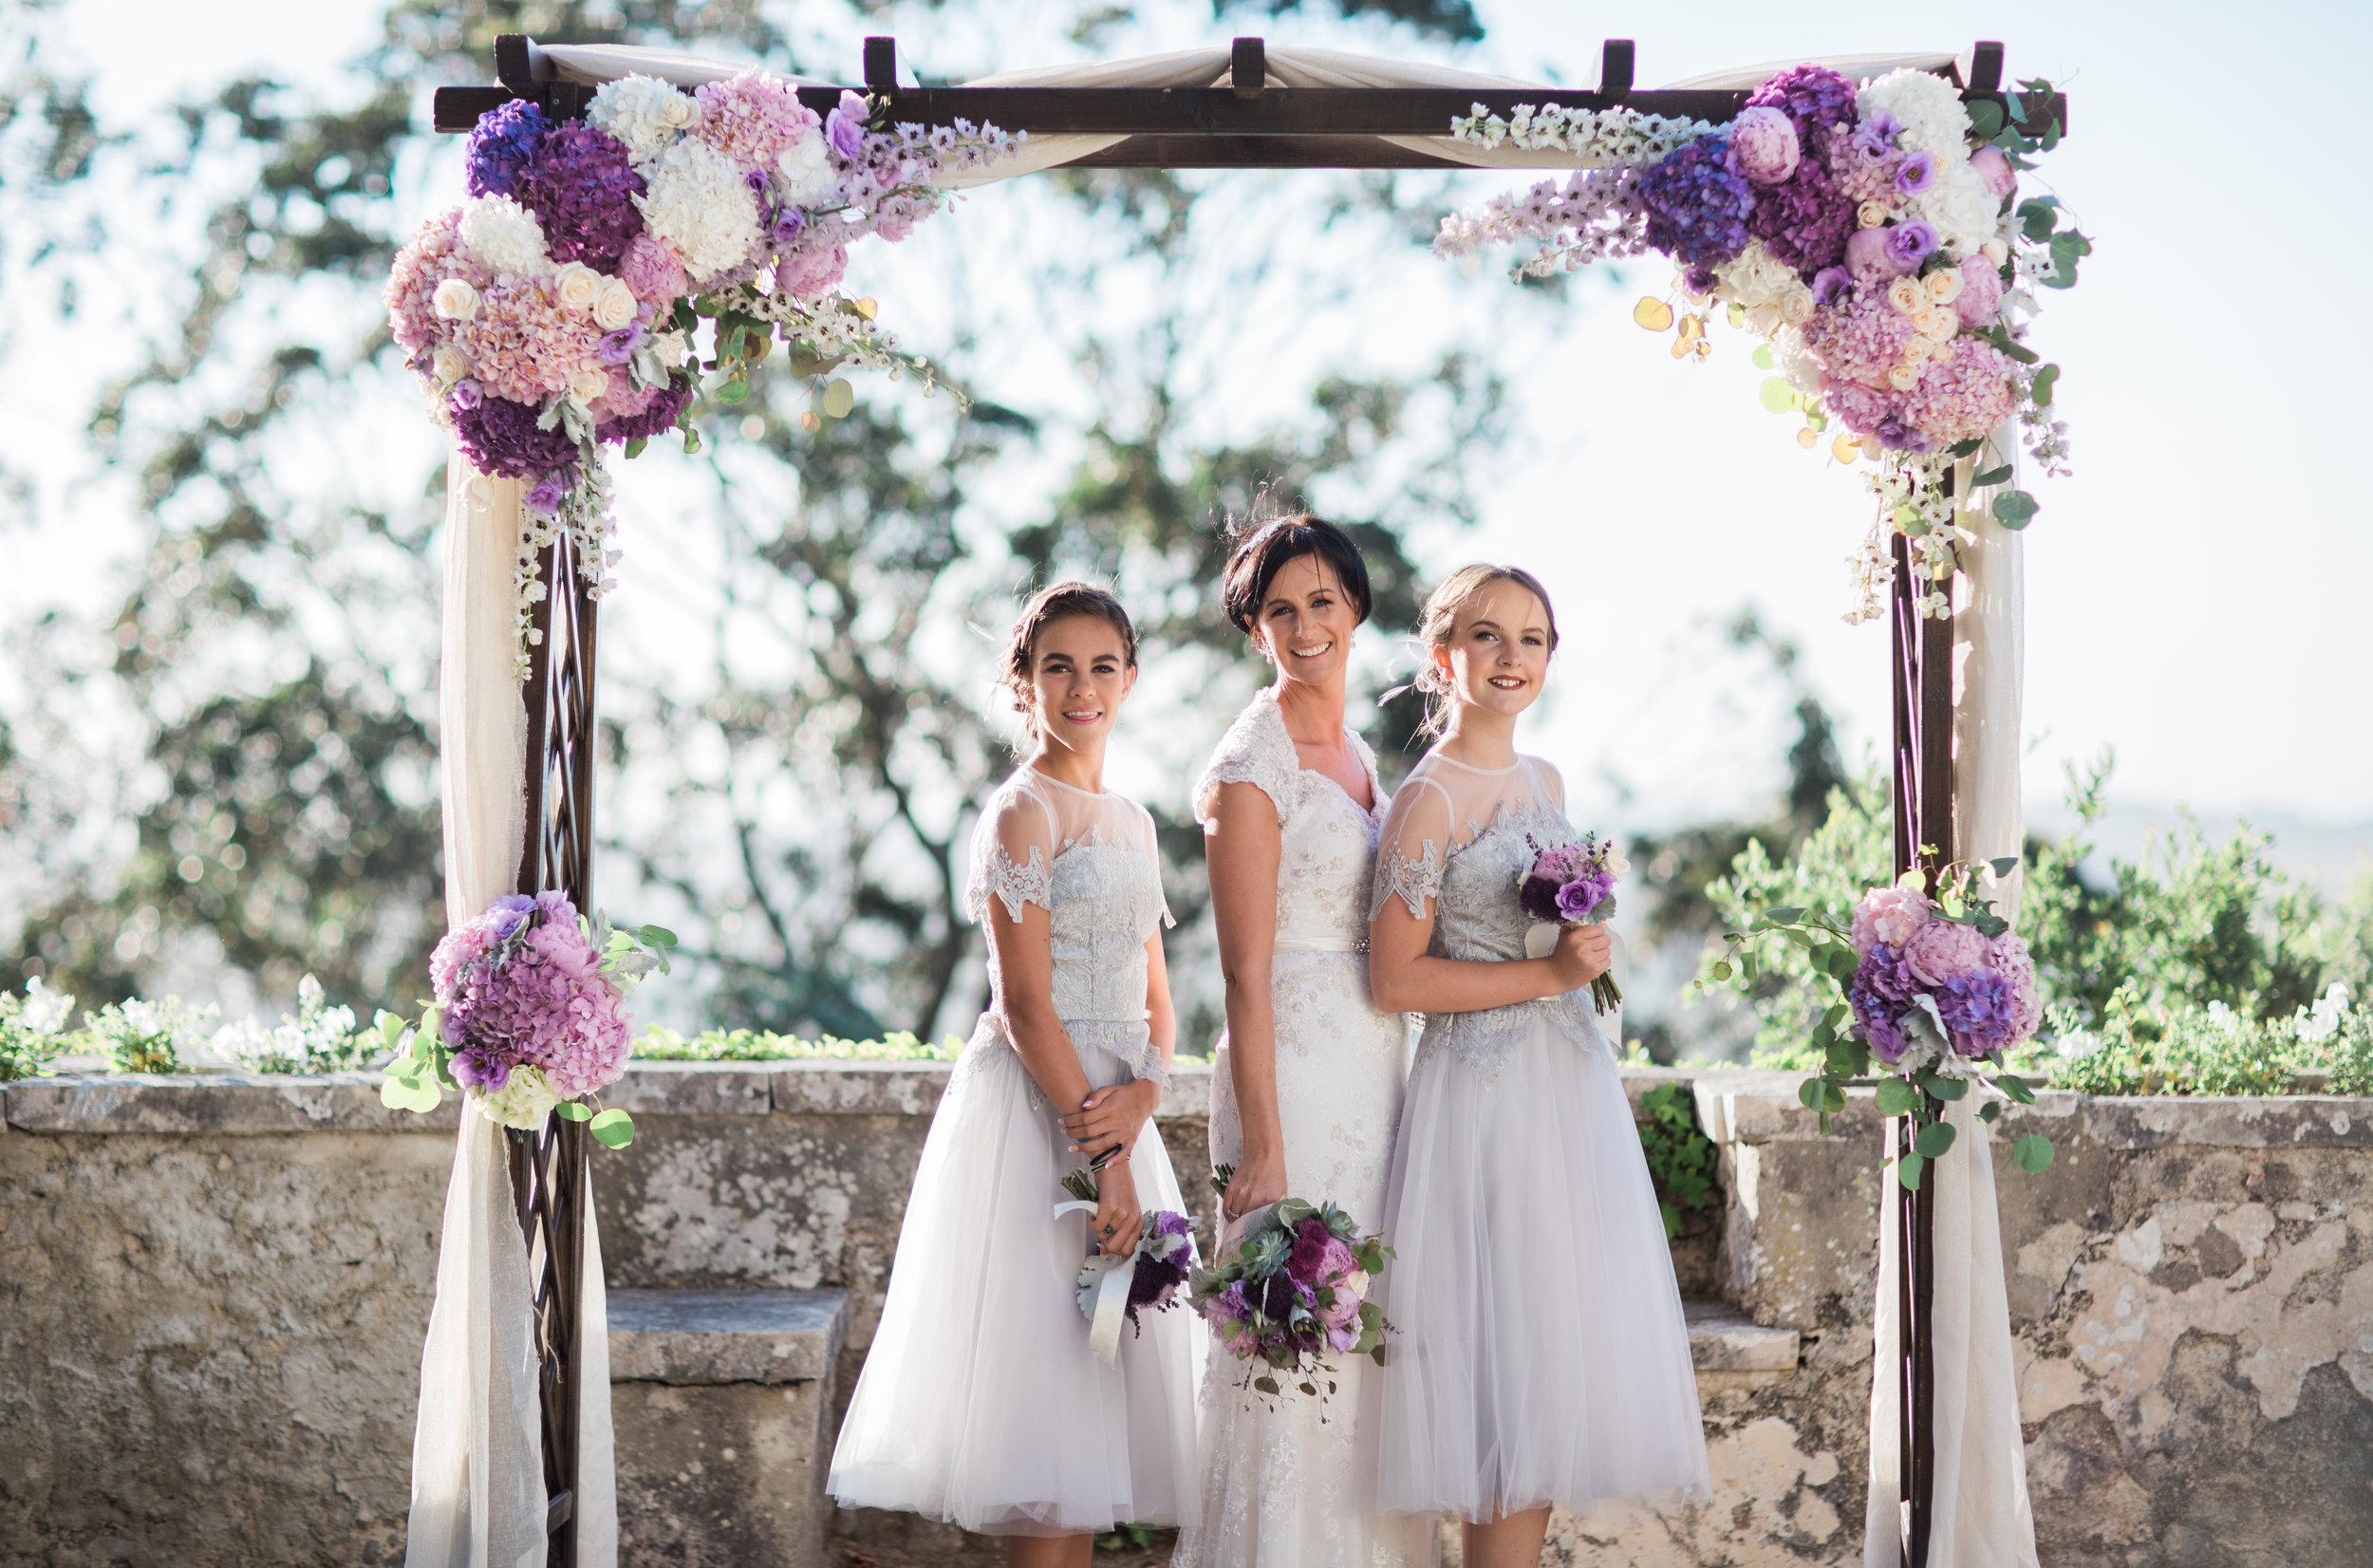 32 mariarao-wedding-palacio-seteais-205.jpg